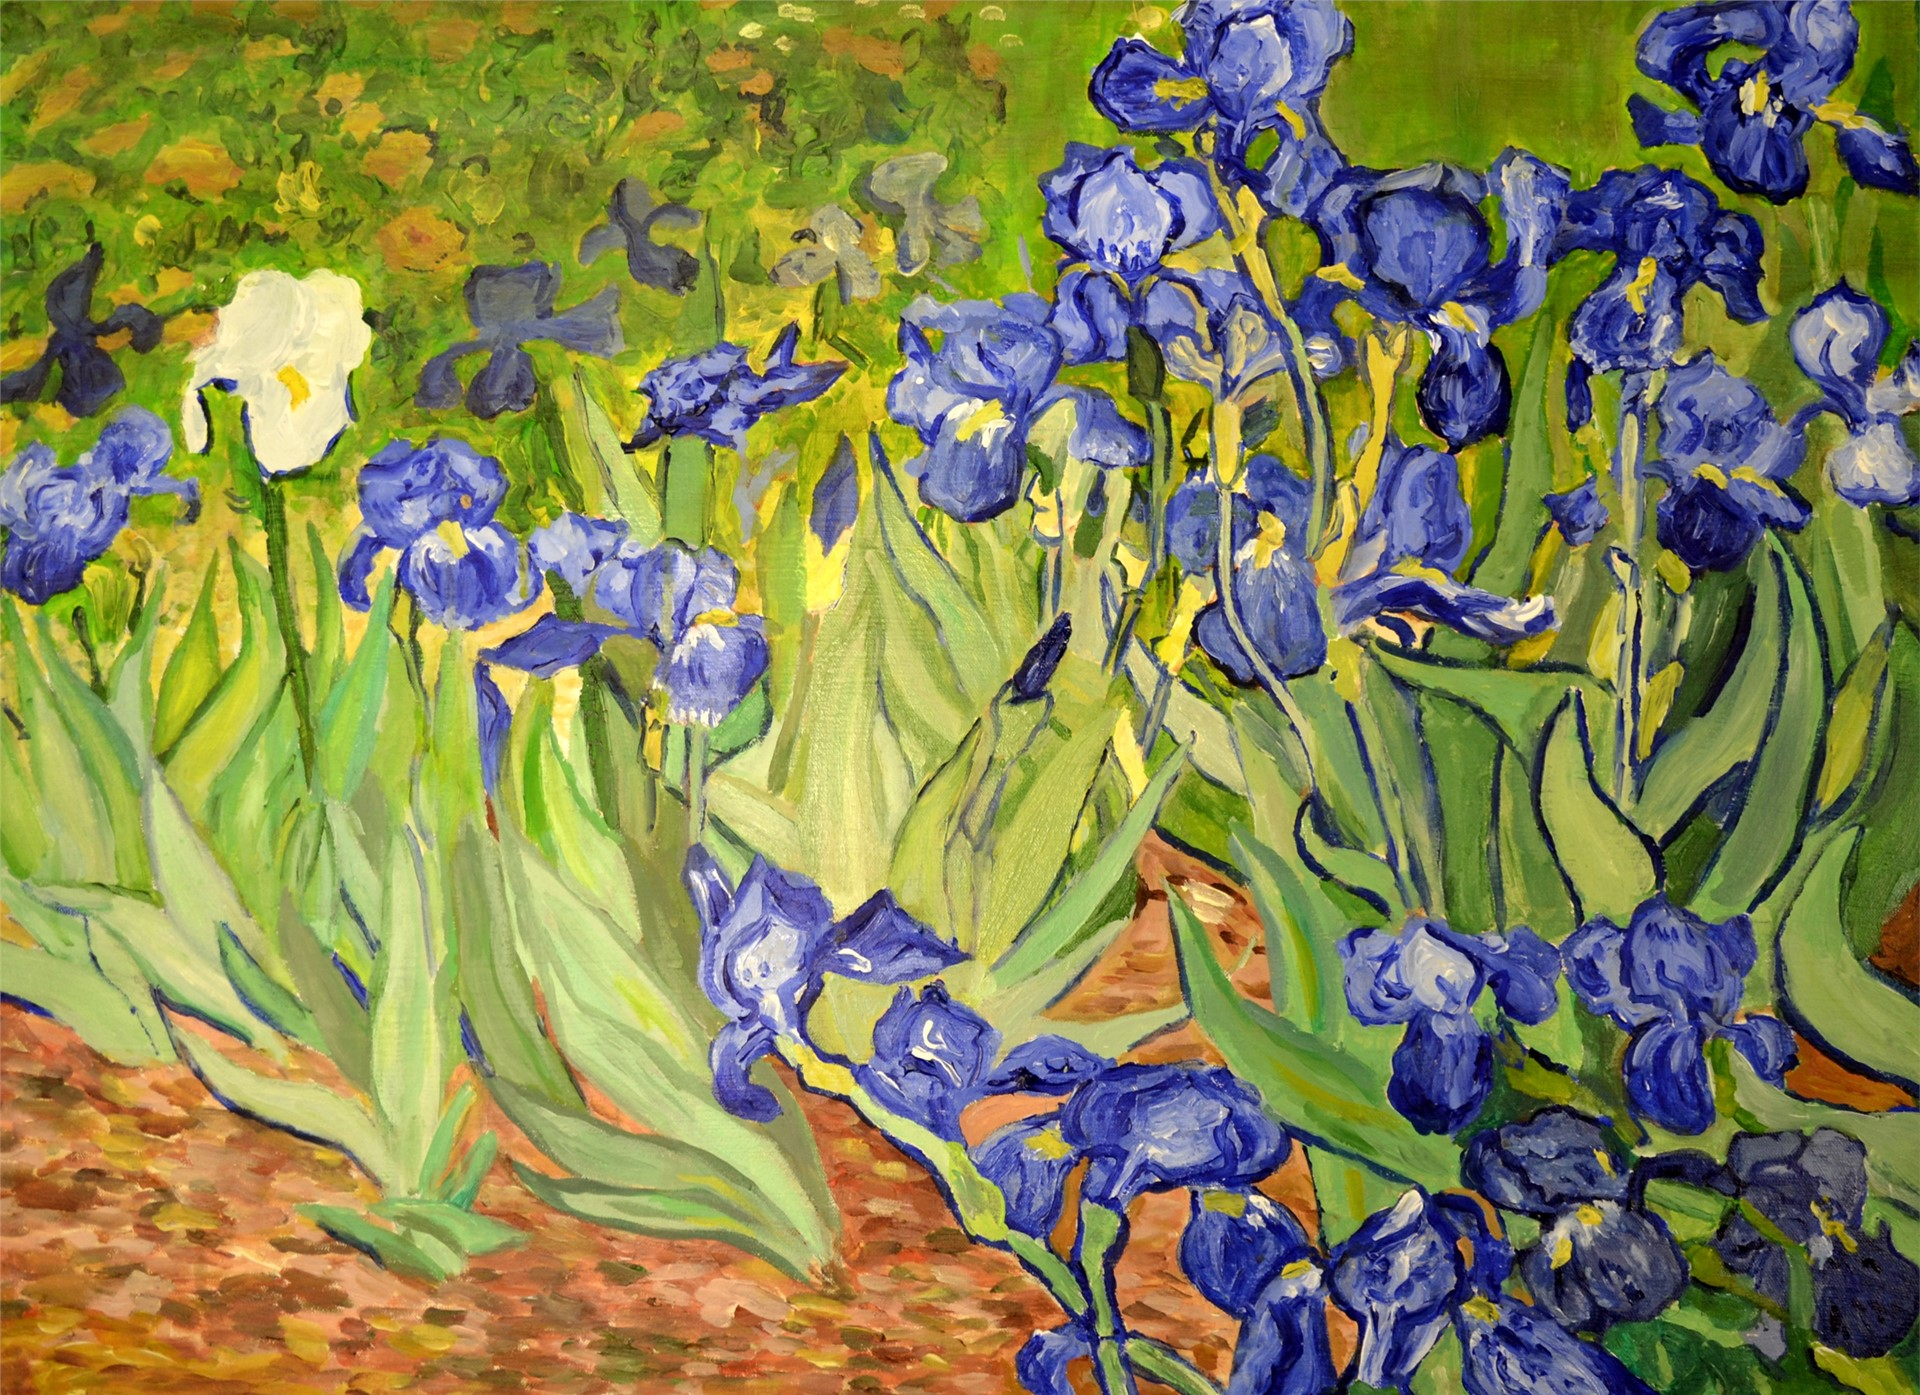 Amanda Rivers after Van Gogh, Irises, acrylic, 22 x 30, 2016